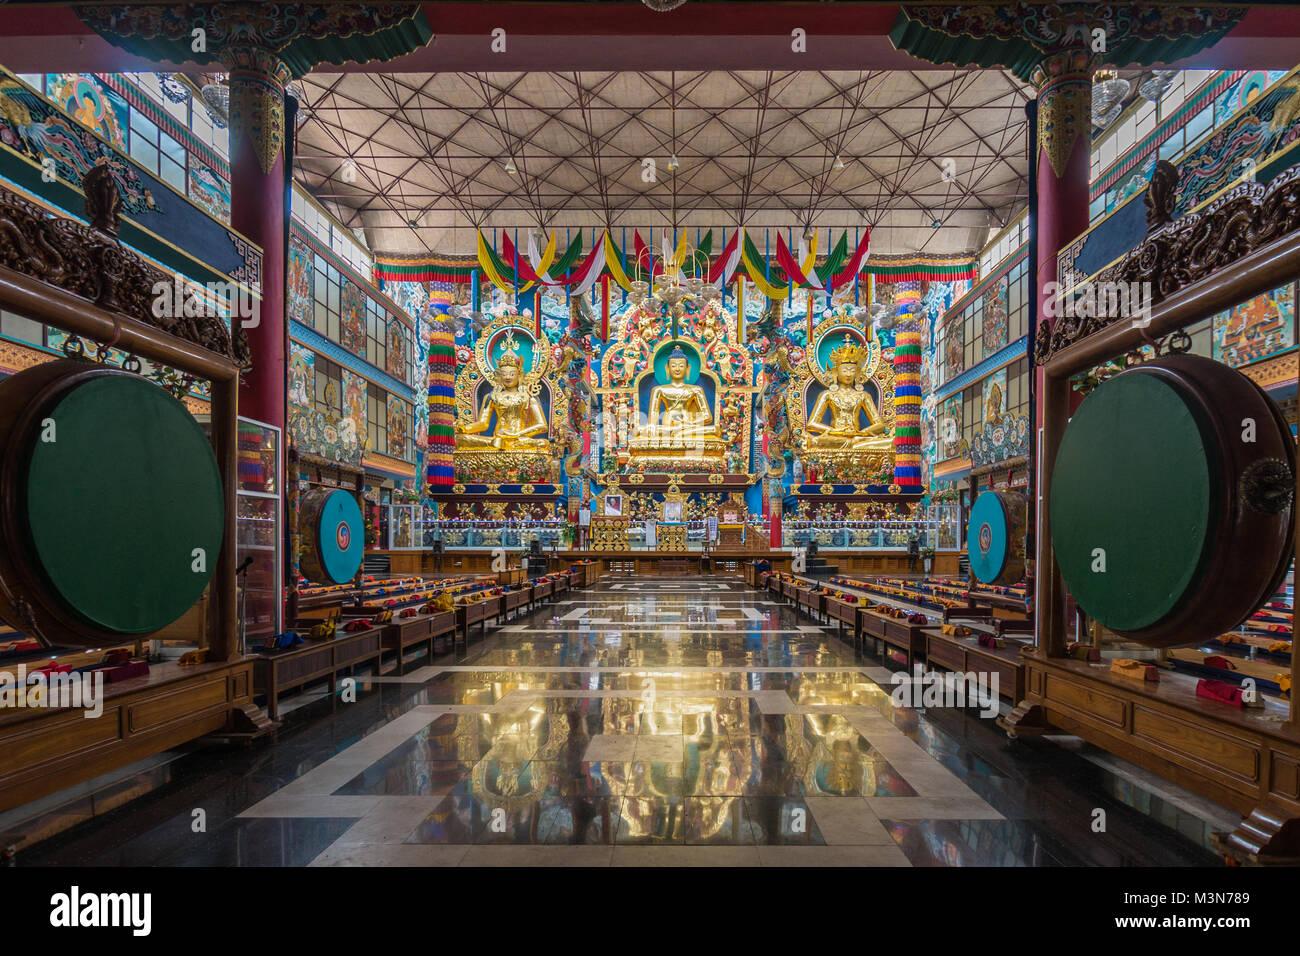 Coorg, India - October 29, 2013: Inside Padmasambhava Vihara of Namdroling Buddhist Monastery. The golden statues Stock Photo